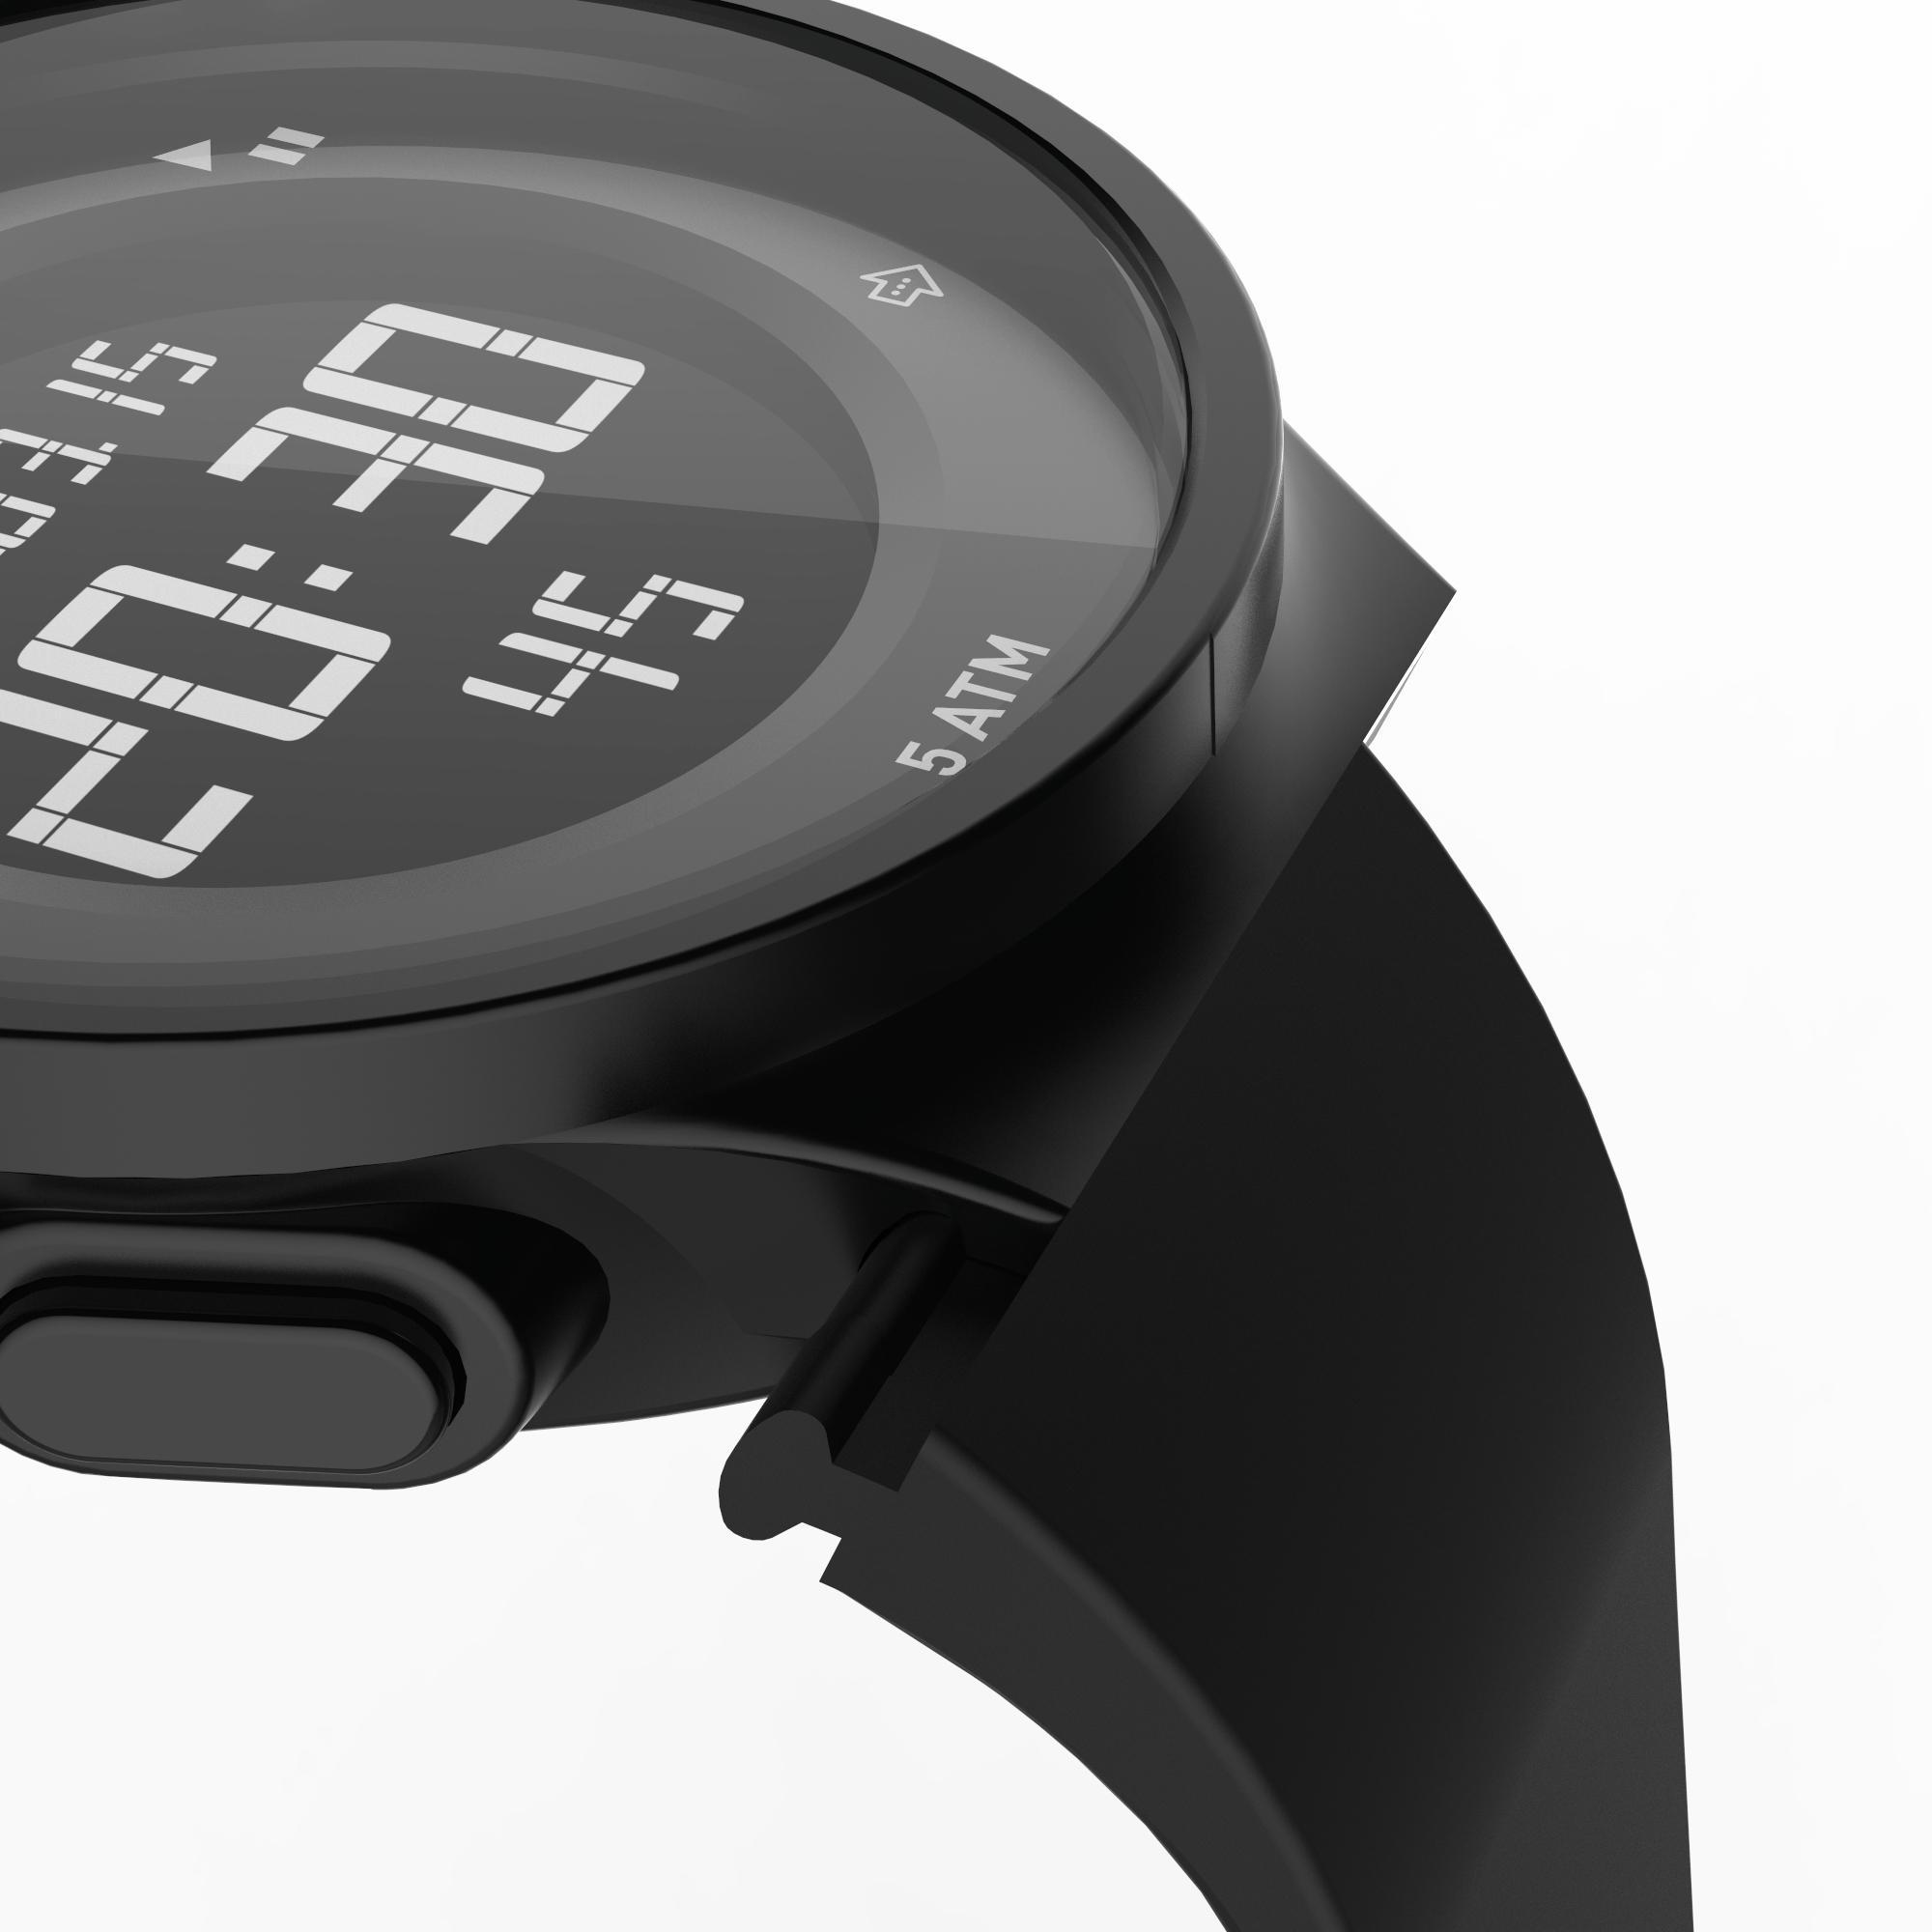 la mejor actitud c94cb d5162 Reloj deportivo temporizador para hombre W500 M SWIP negro